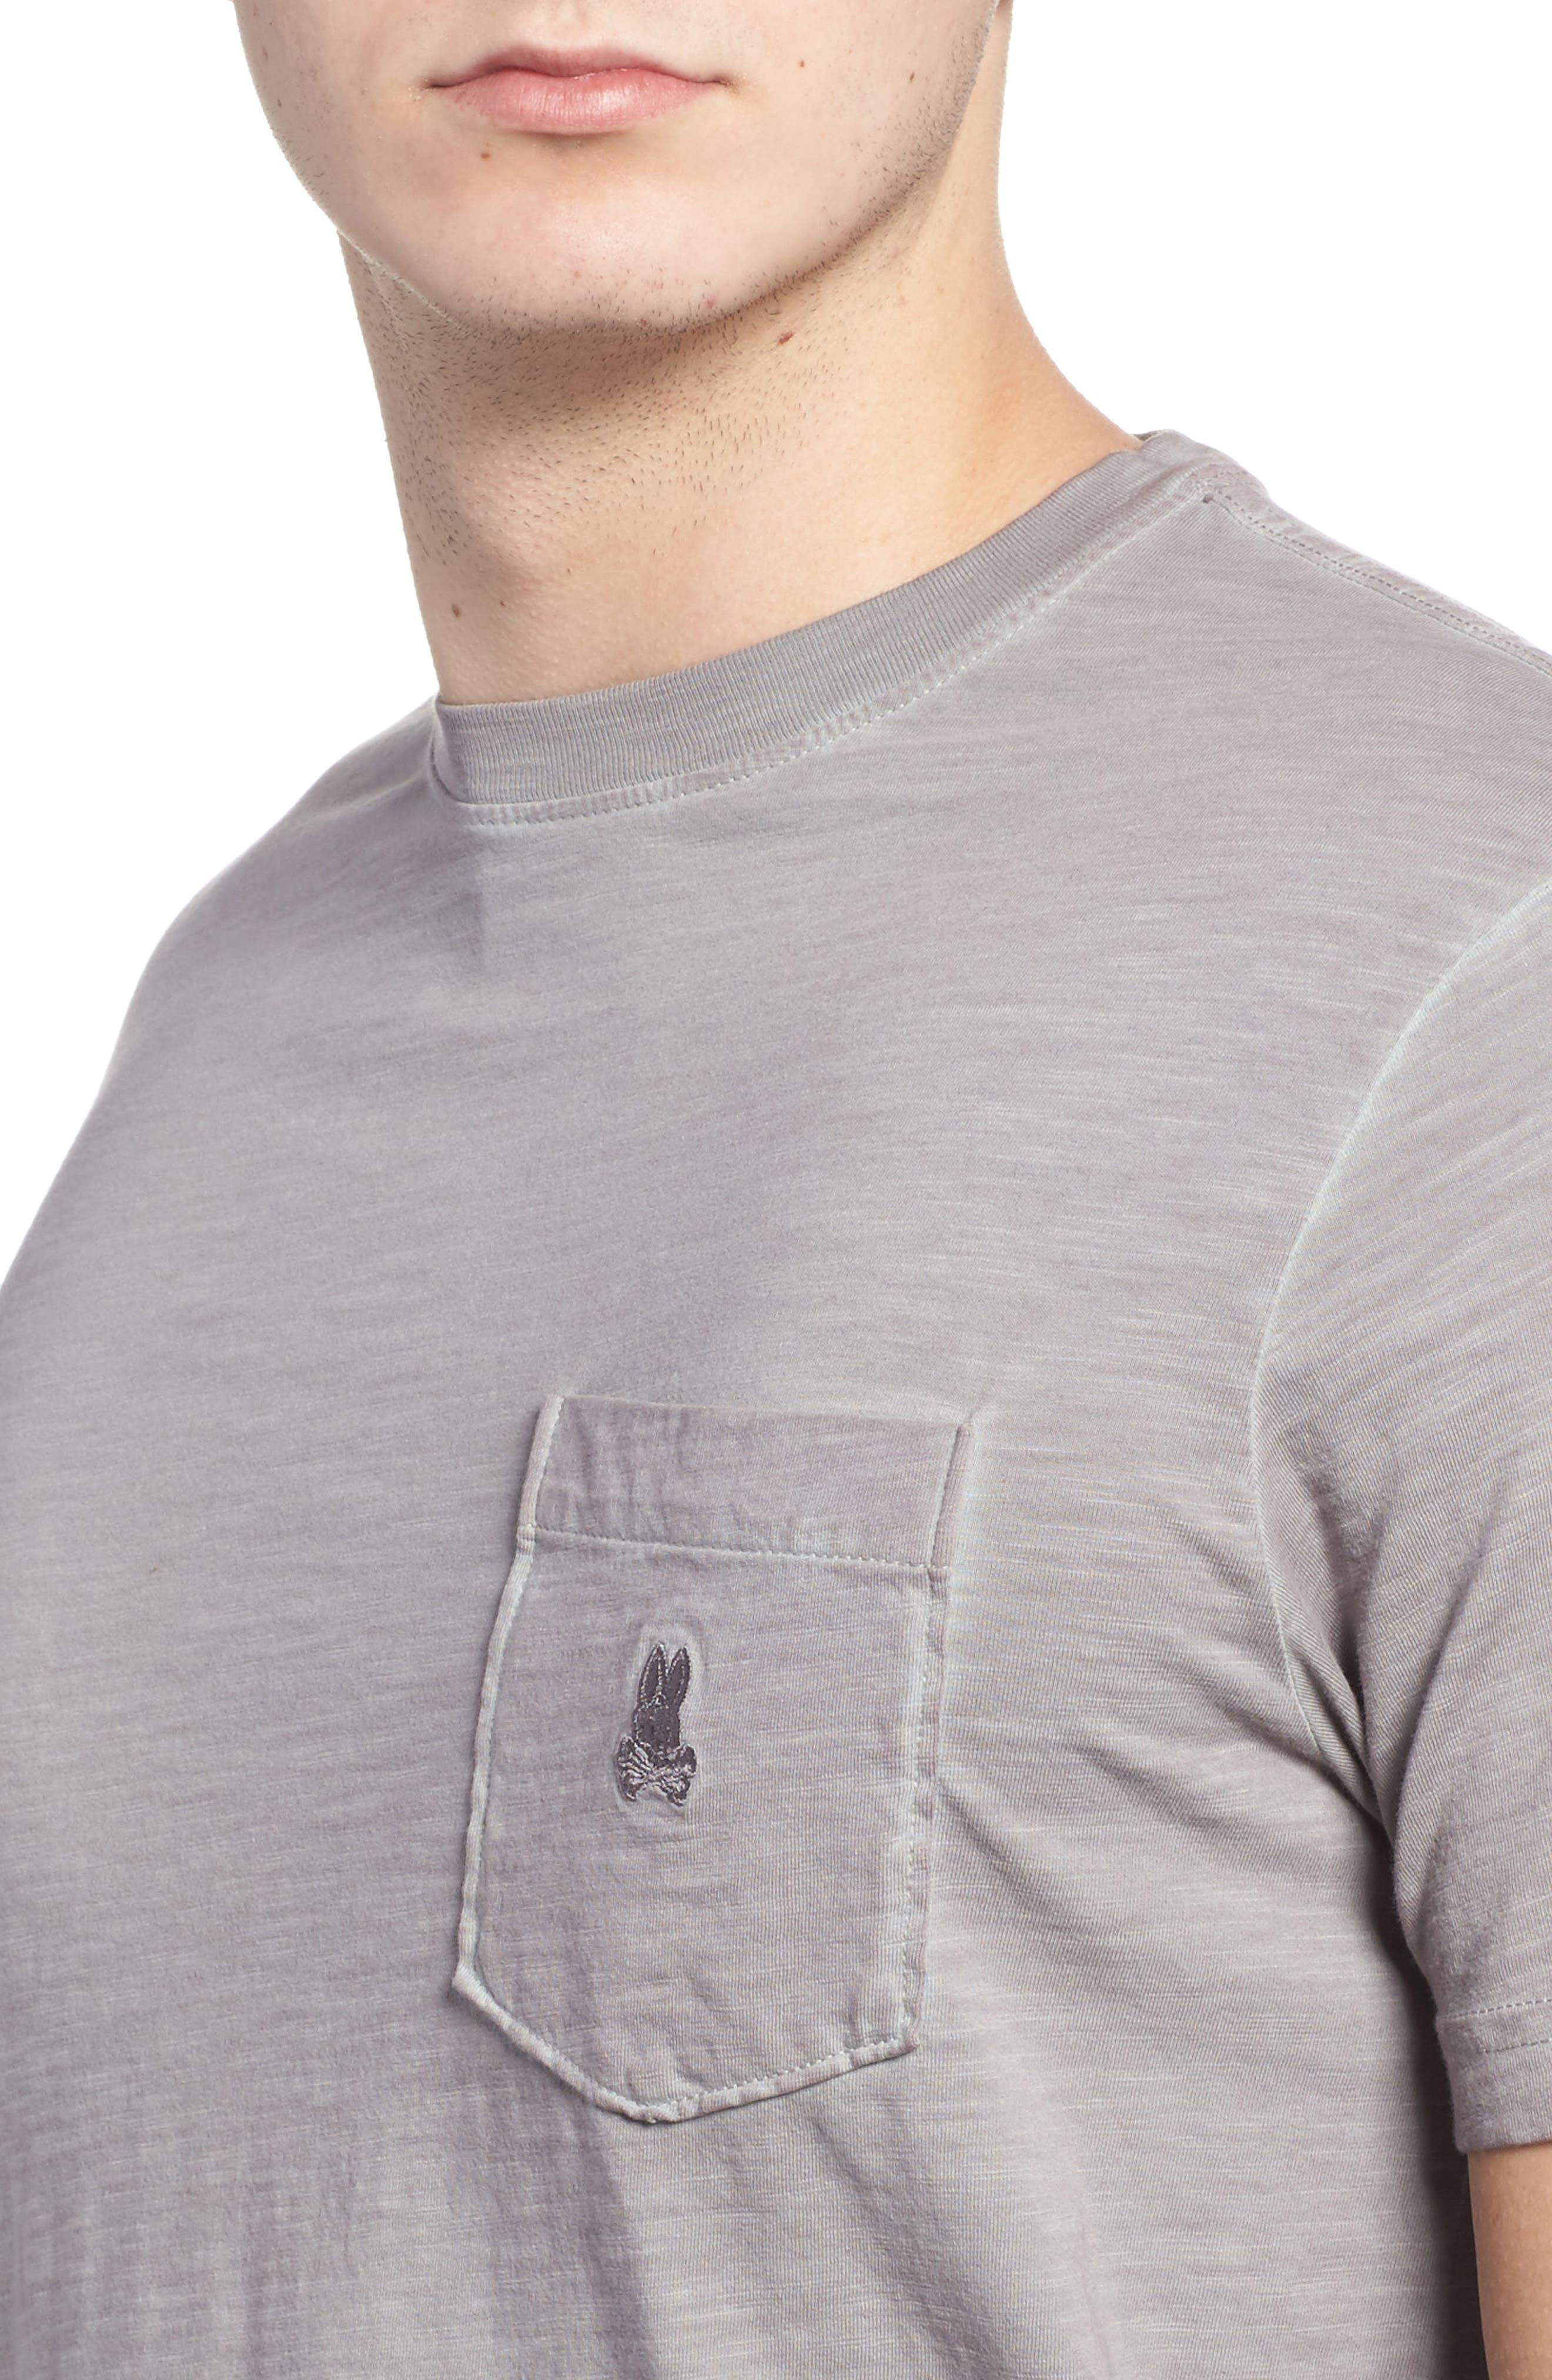 Sunwash Pocket T-Shirt,                             Alternate thumbnail 4, color,                             017